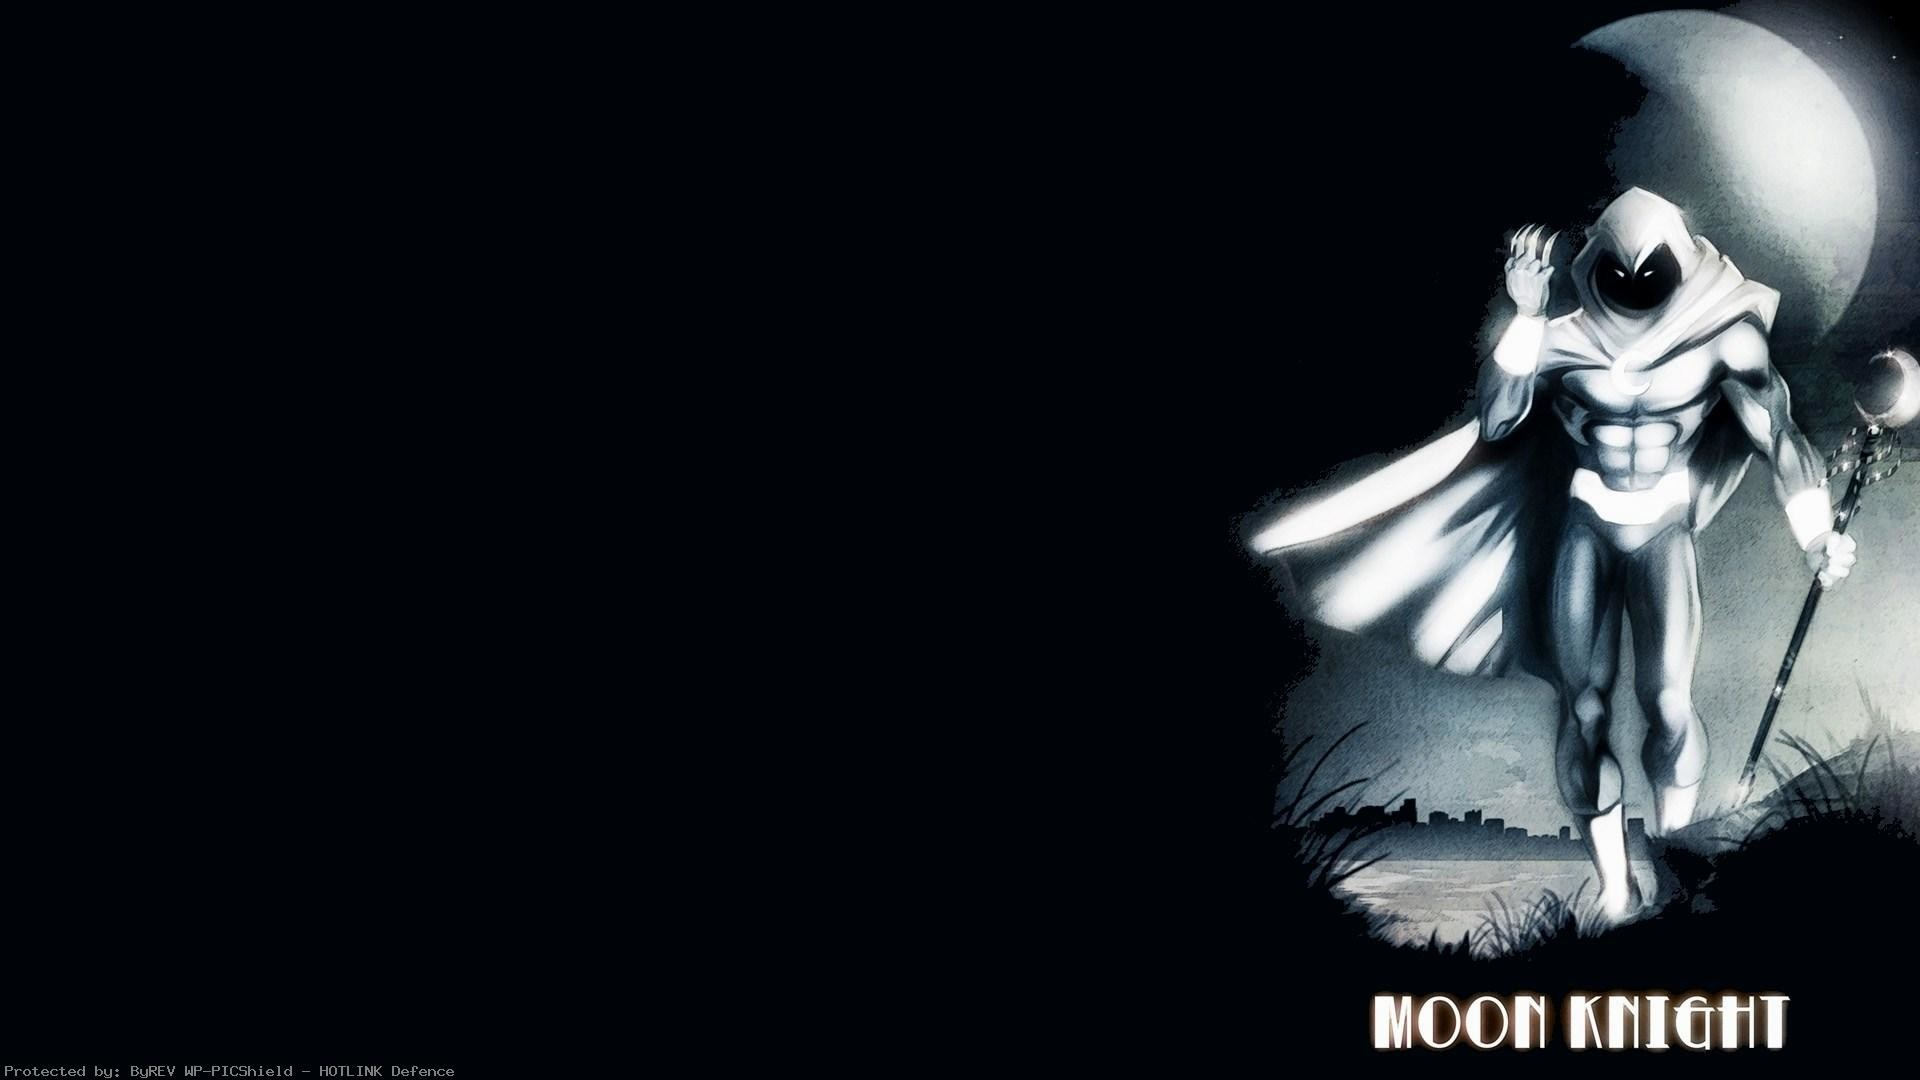 Koshon-Mason-free-and-screensavers-for-moon-knight-